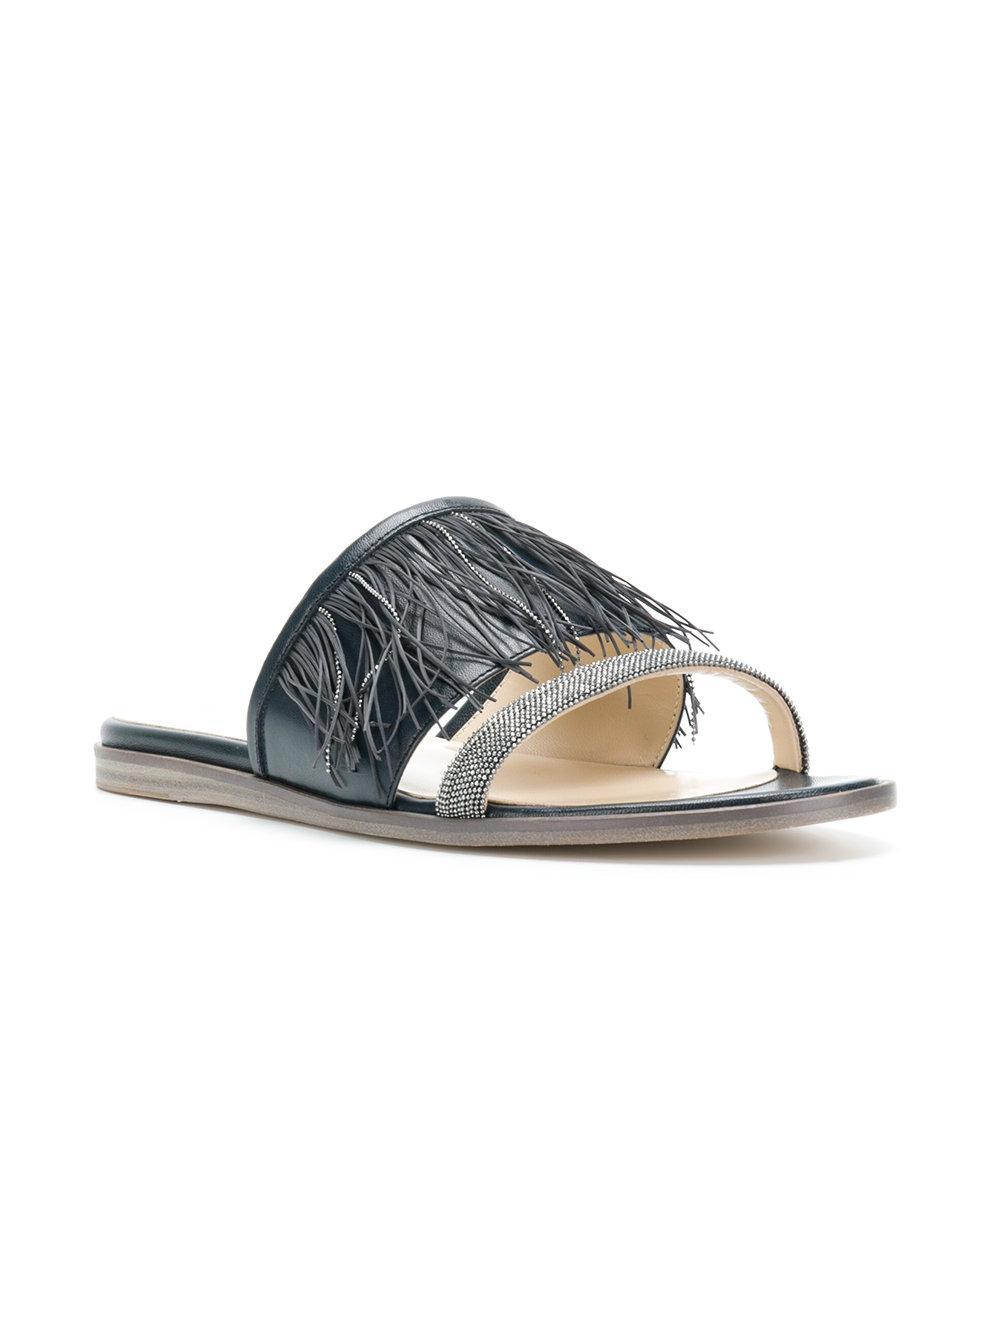 fringed sandals - Blue Fabiana Filippi 5g4kTv